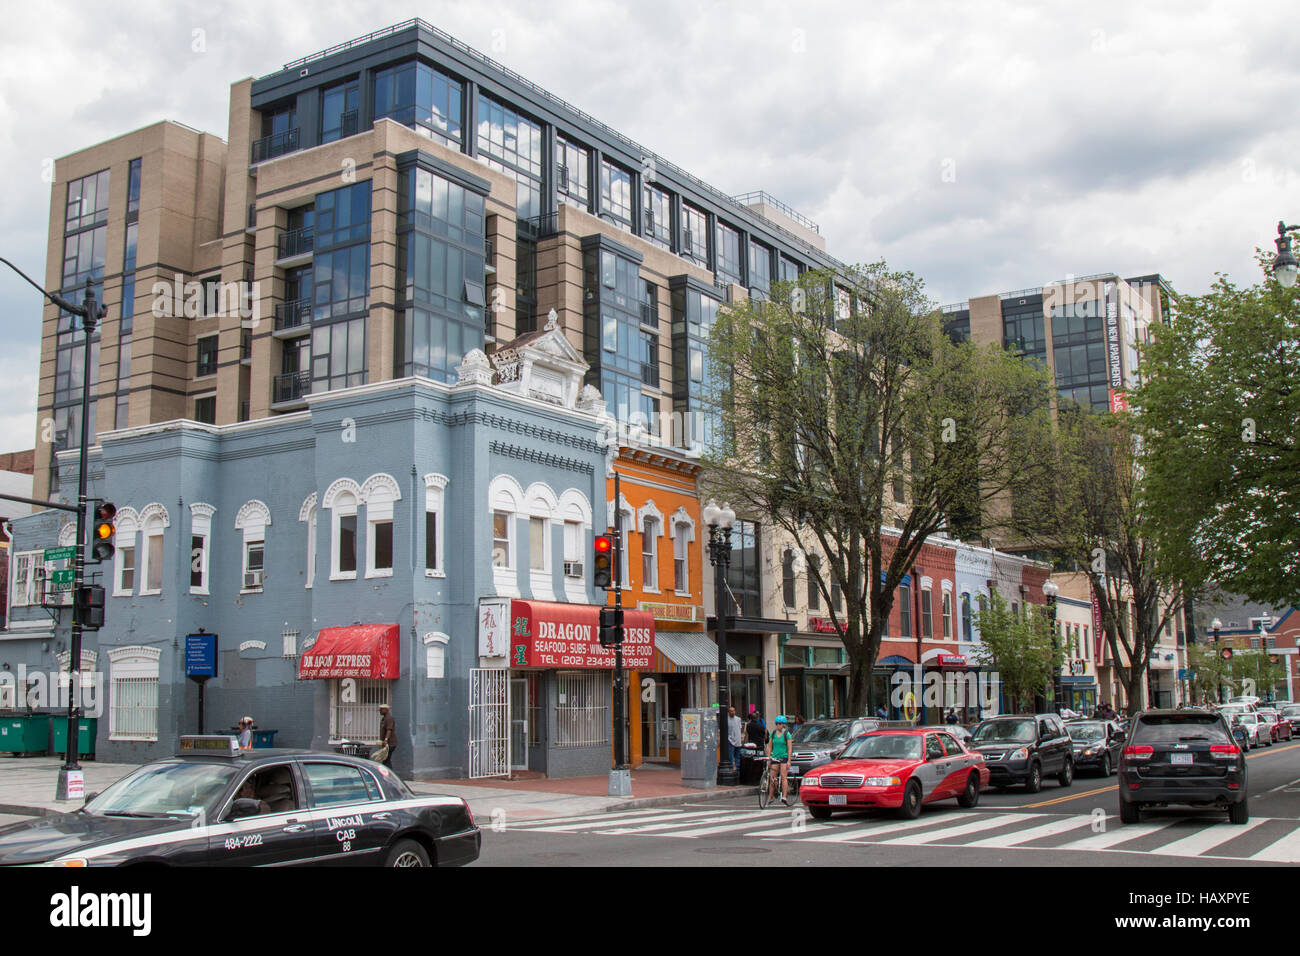 7th and T Streets NW, Shaw neighborhood near Howard University in Washington DC. - Stock Image